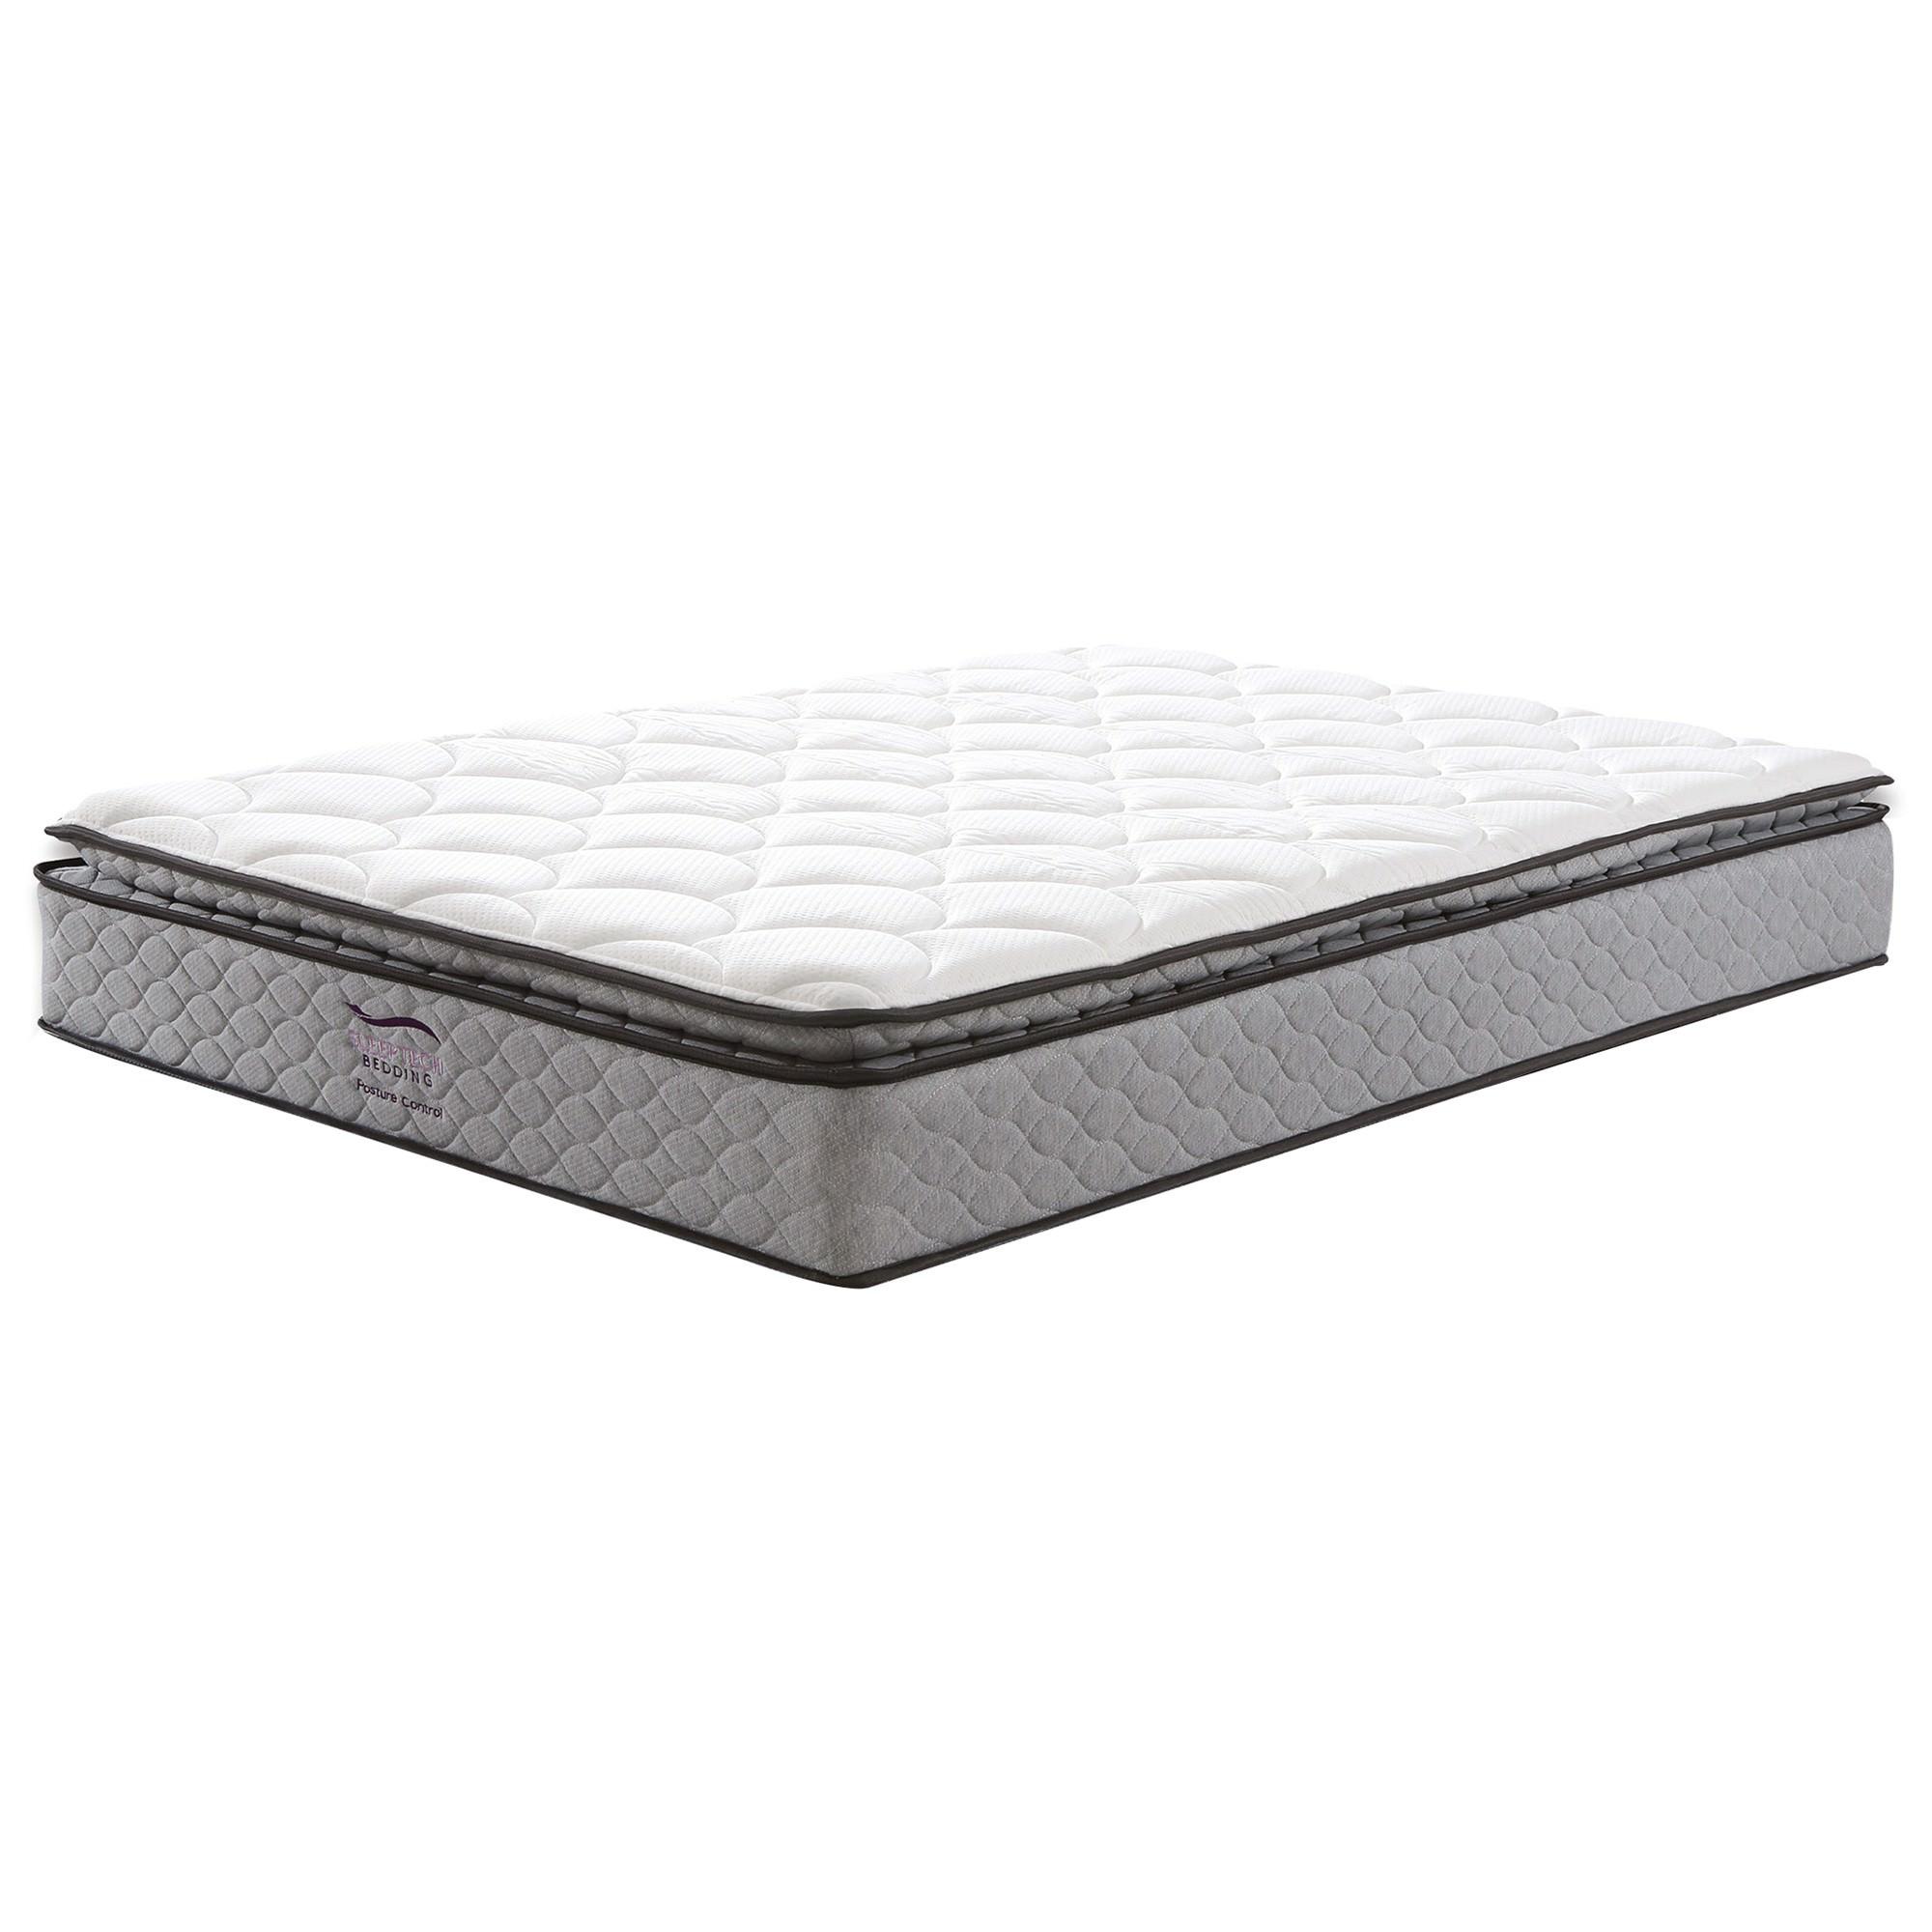 DreamHub Control Bonnell Spring Mattress, Pillow Top, Double